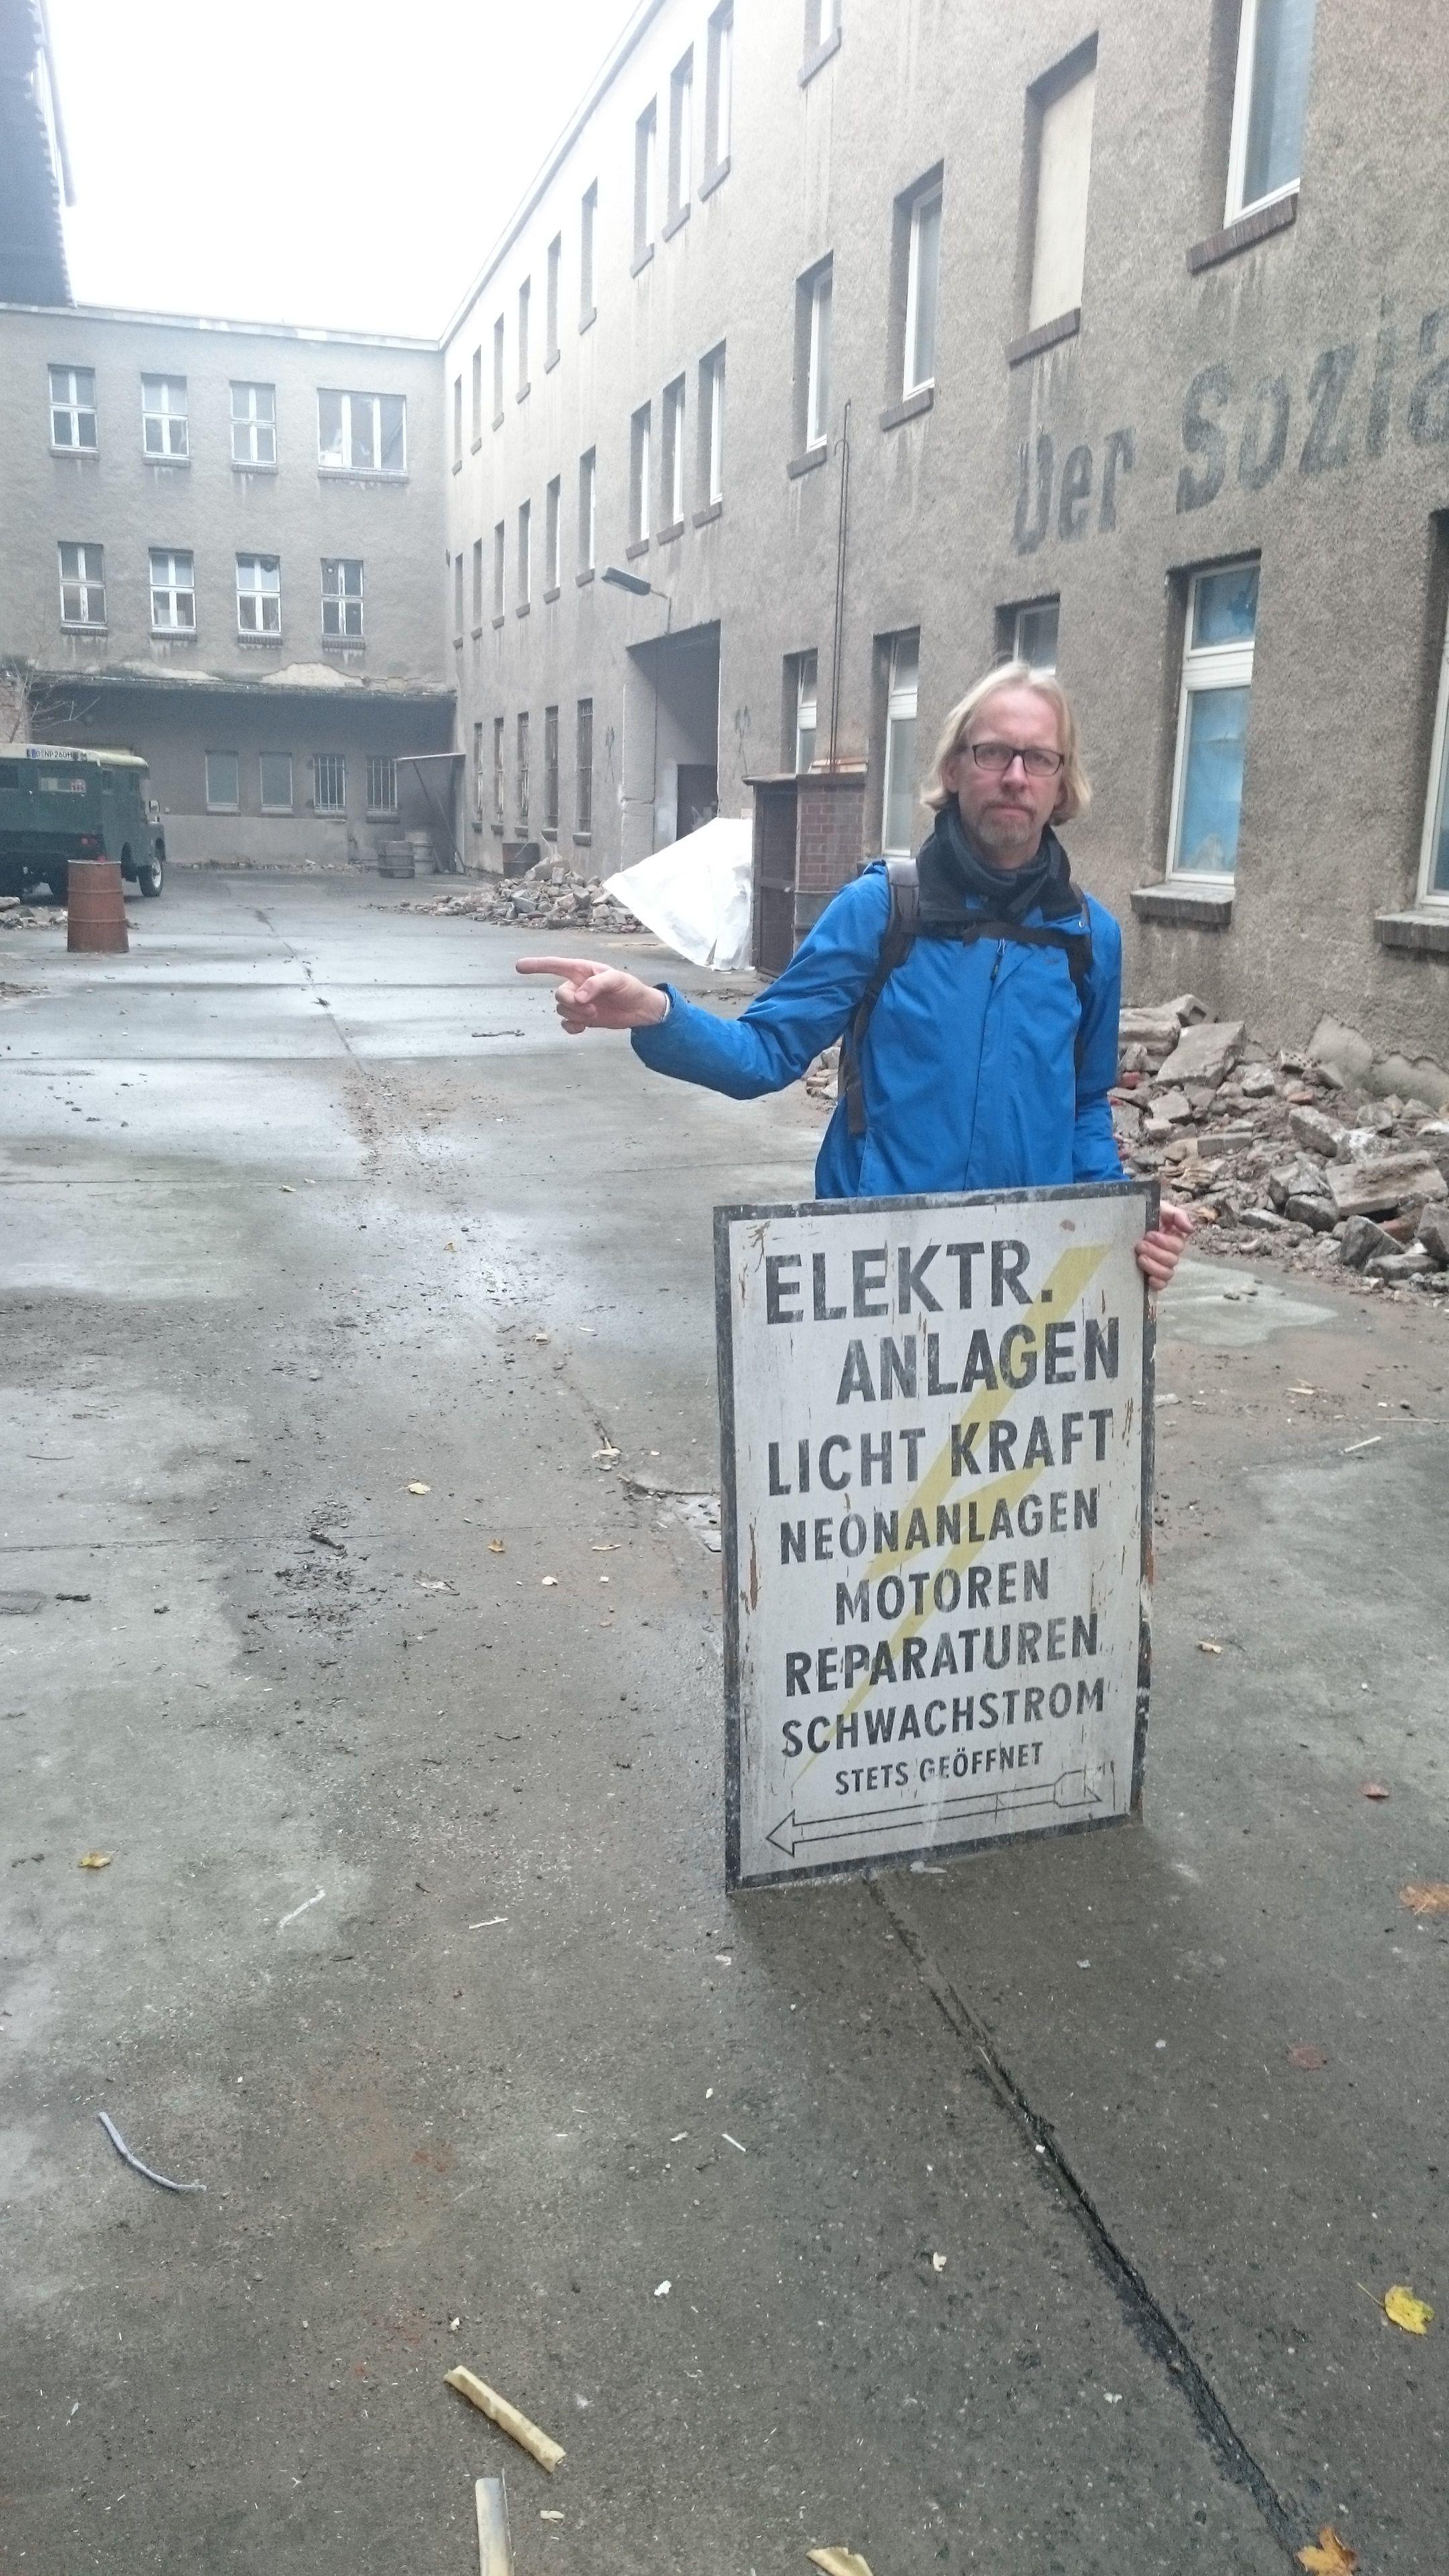 http://www.schneidersbuero.de/wp-content/uploads/2015/04/Da_gehts_LANG.jpg